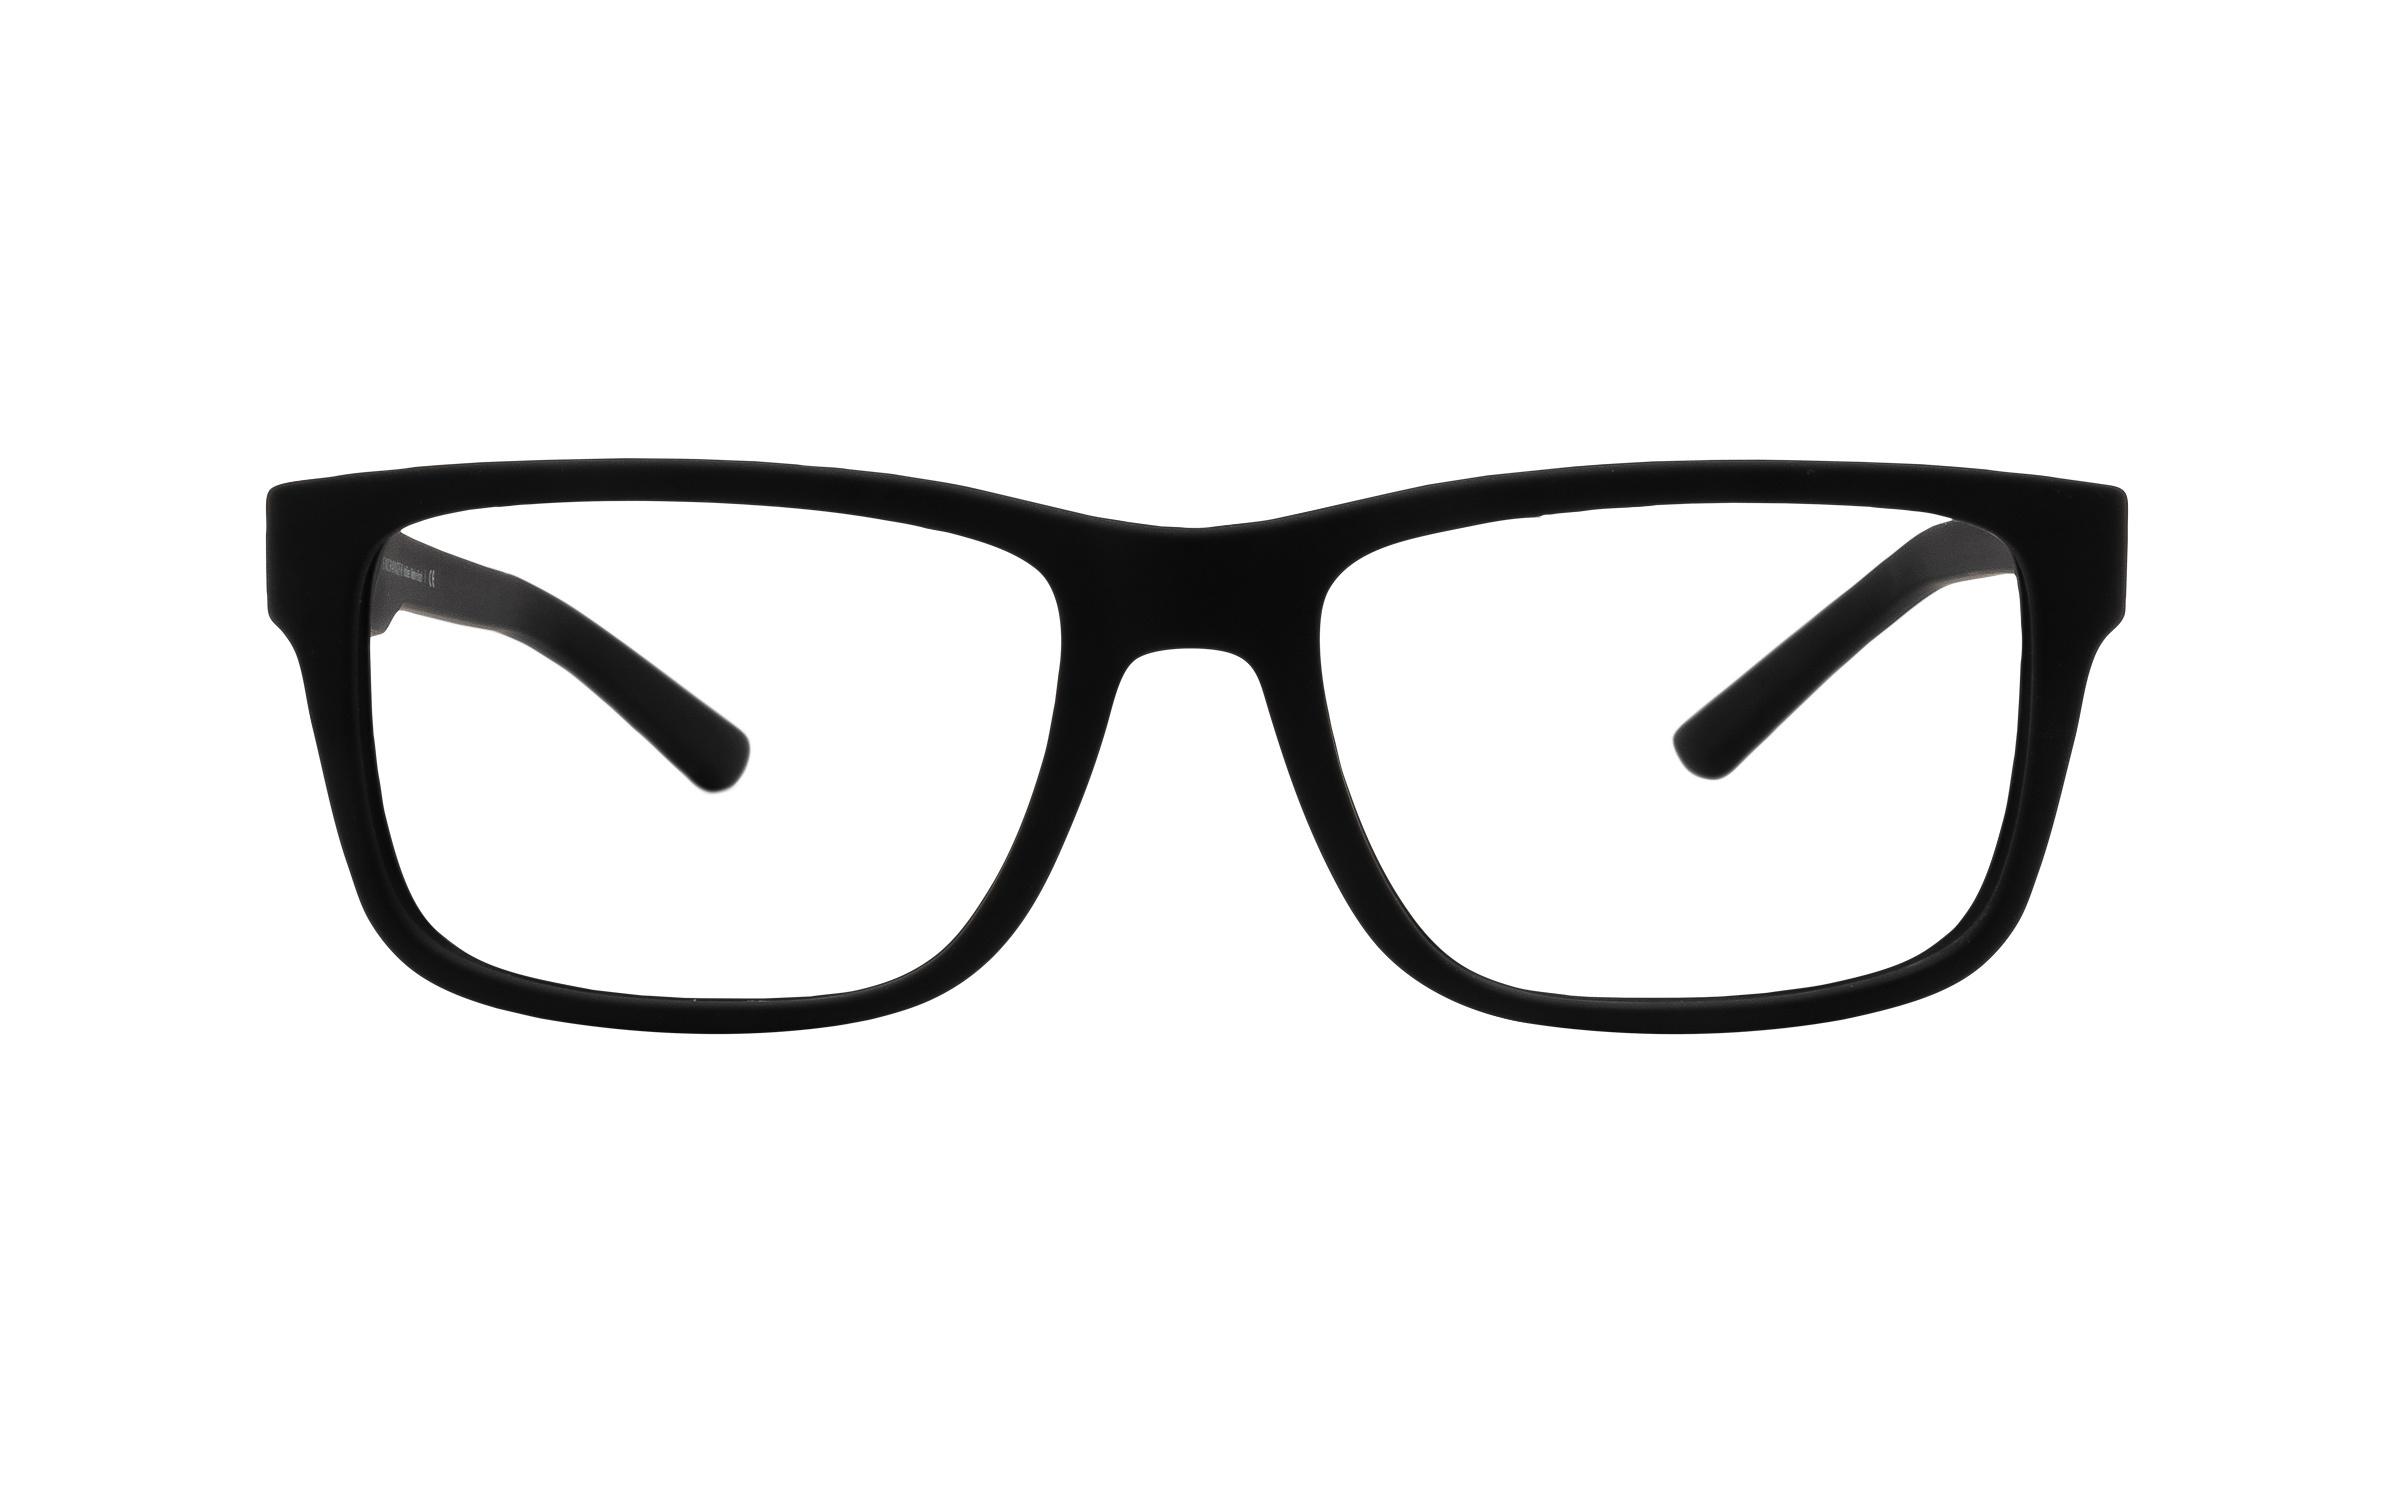 Armani Exchange AX3016 8078 (53) Eyeglasses and Frame in Matte Black - Online Coastal